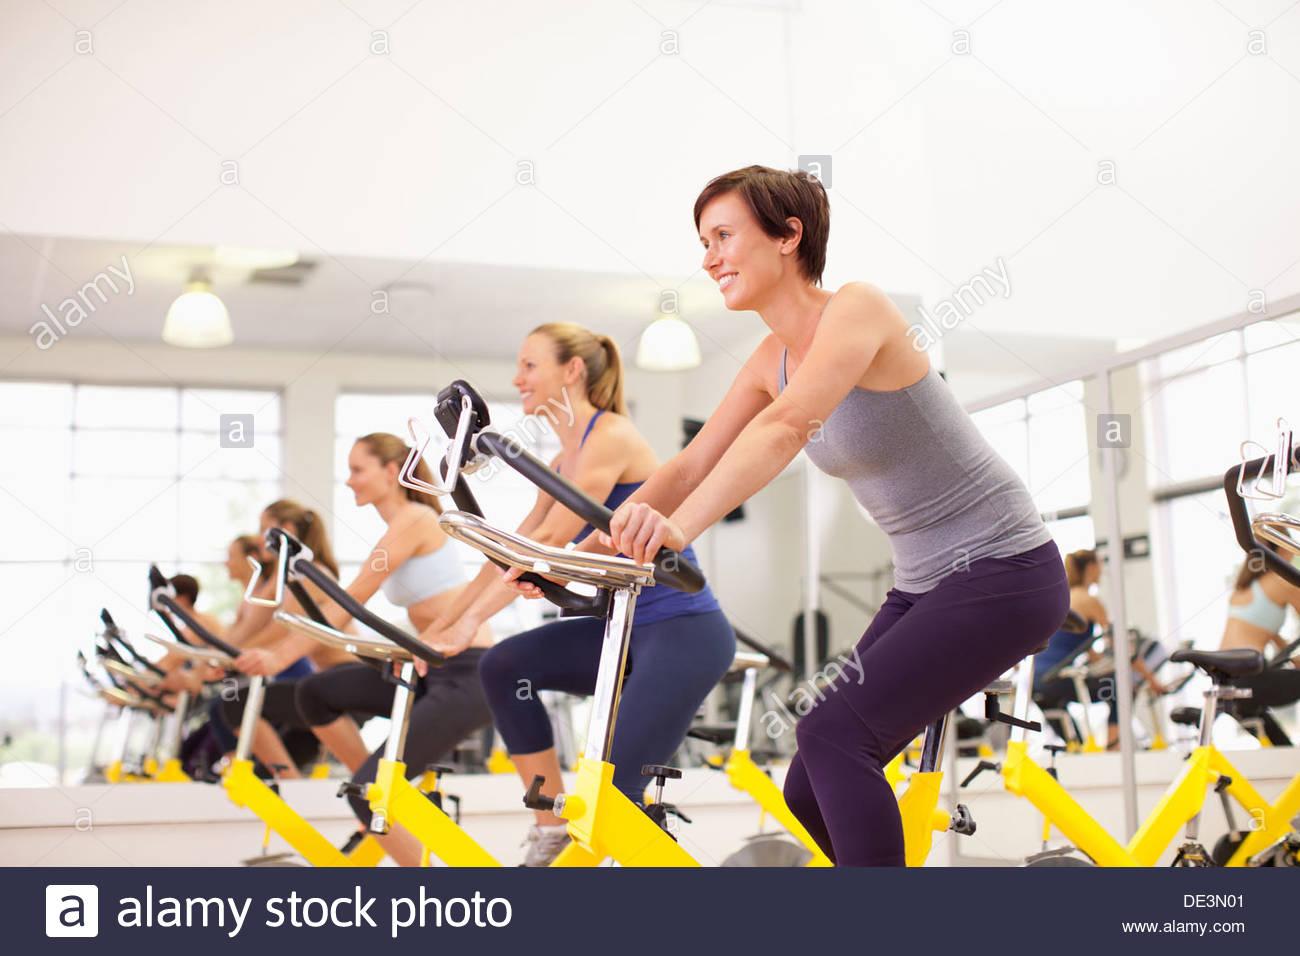 Portrait of smiling women on exercise bikes in gymnasium - Stock Image